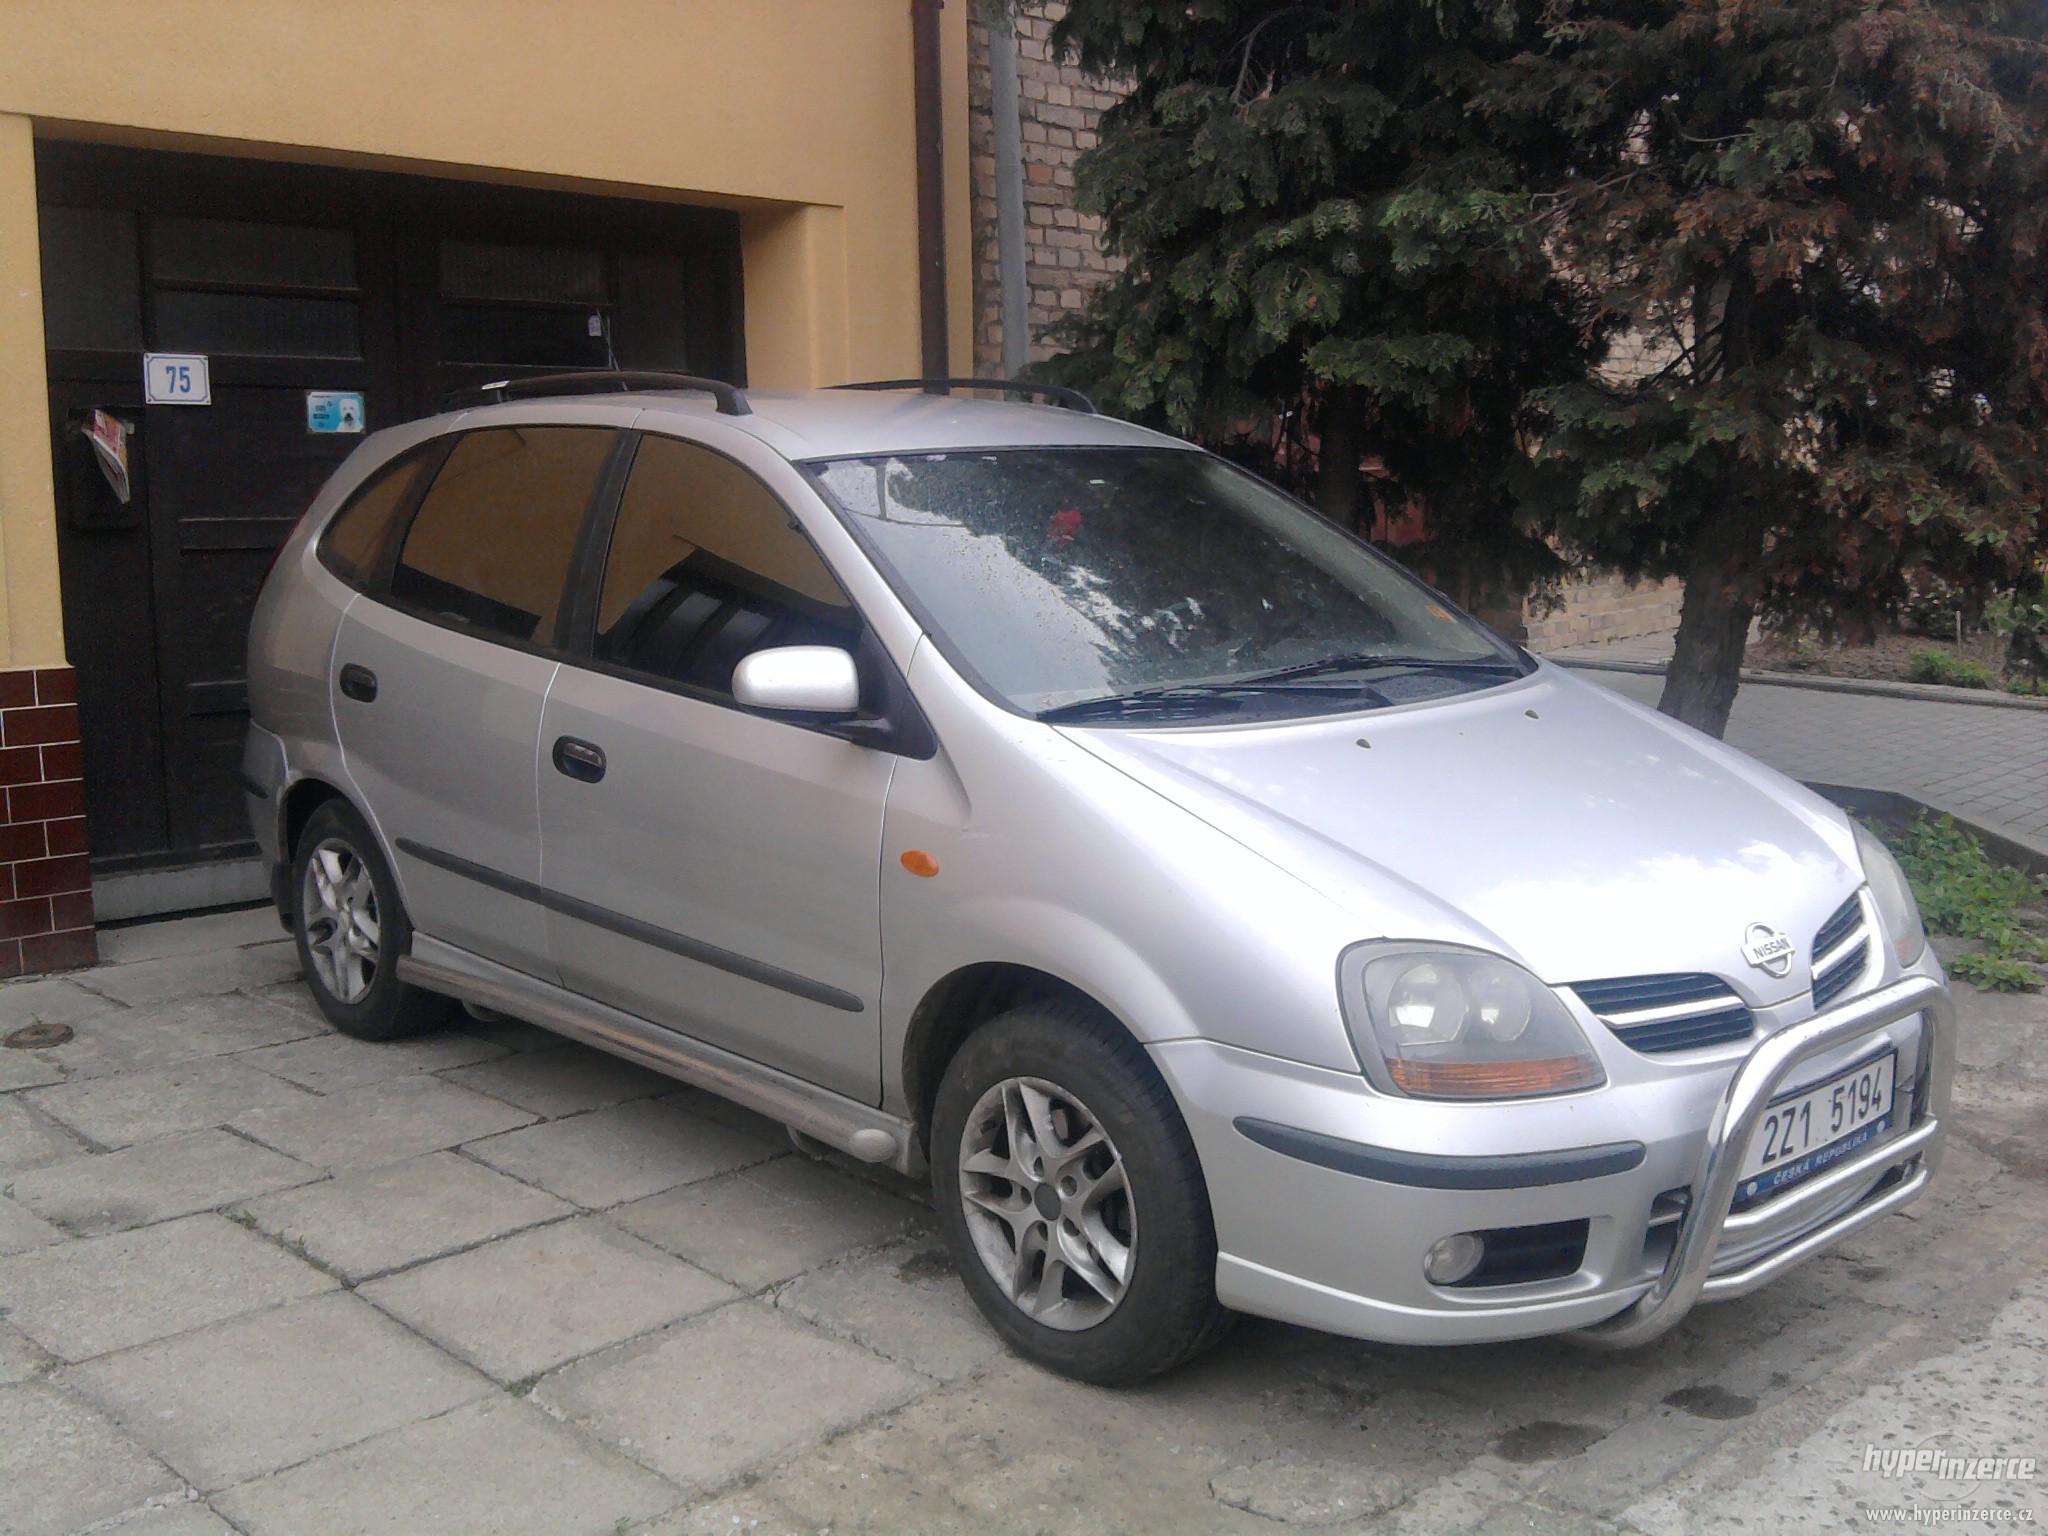 Nissan Almera Tino Image 3